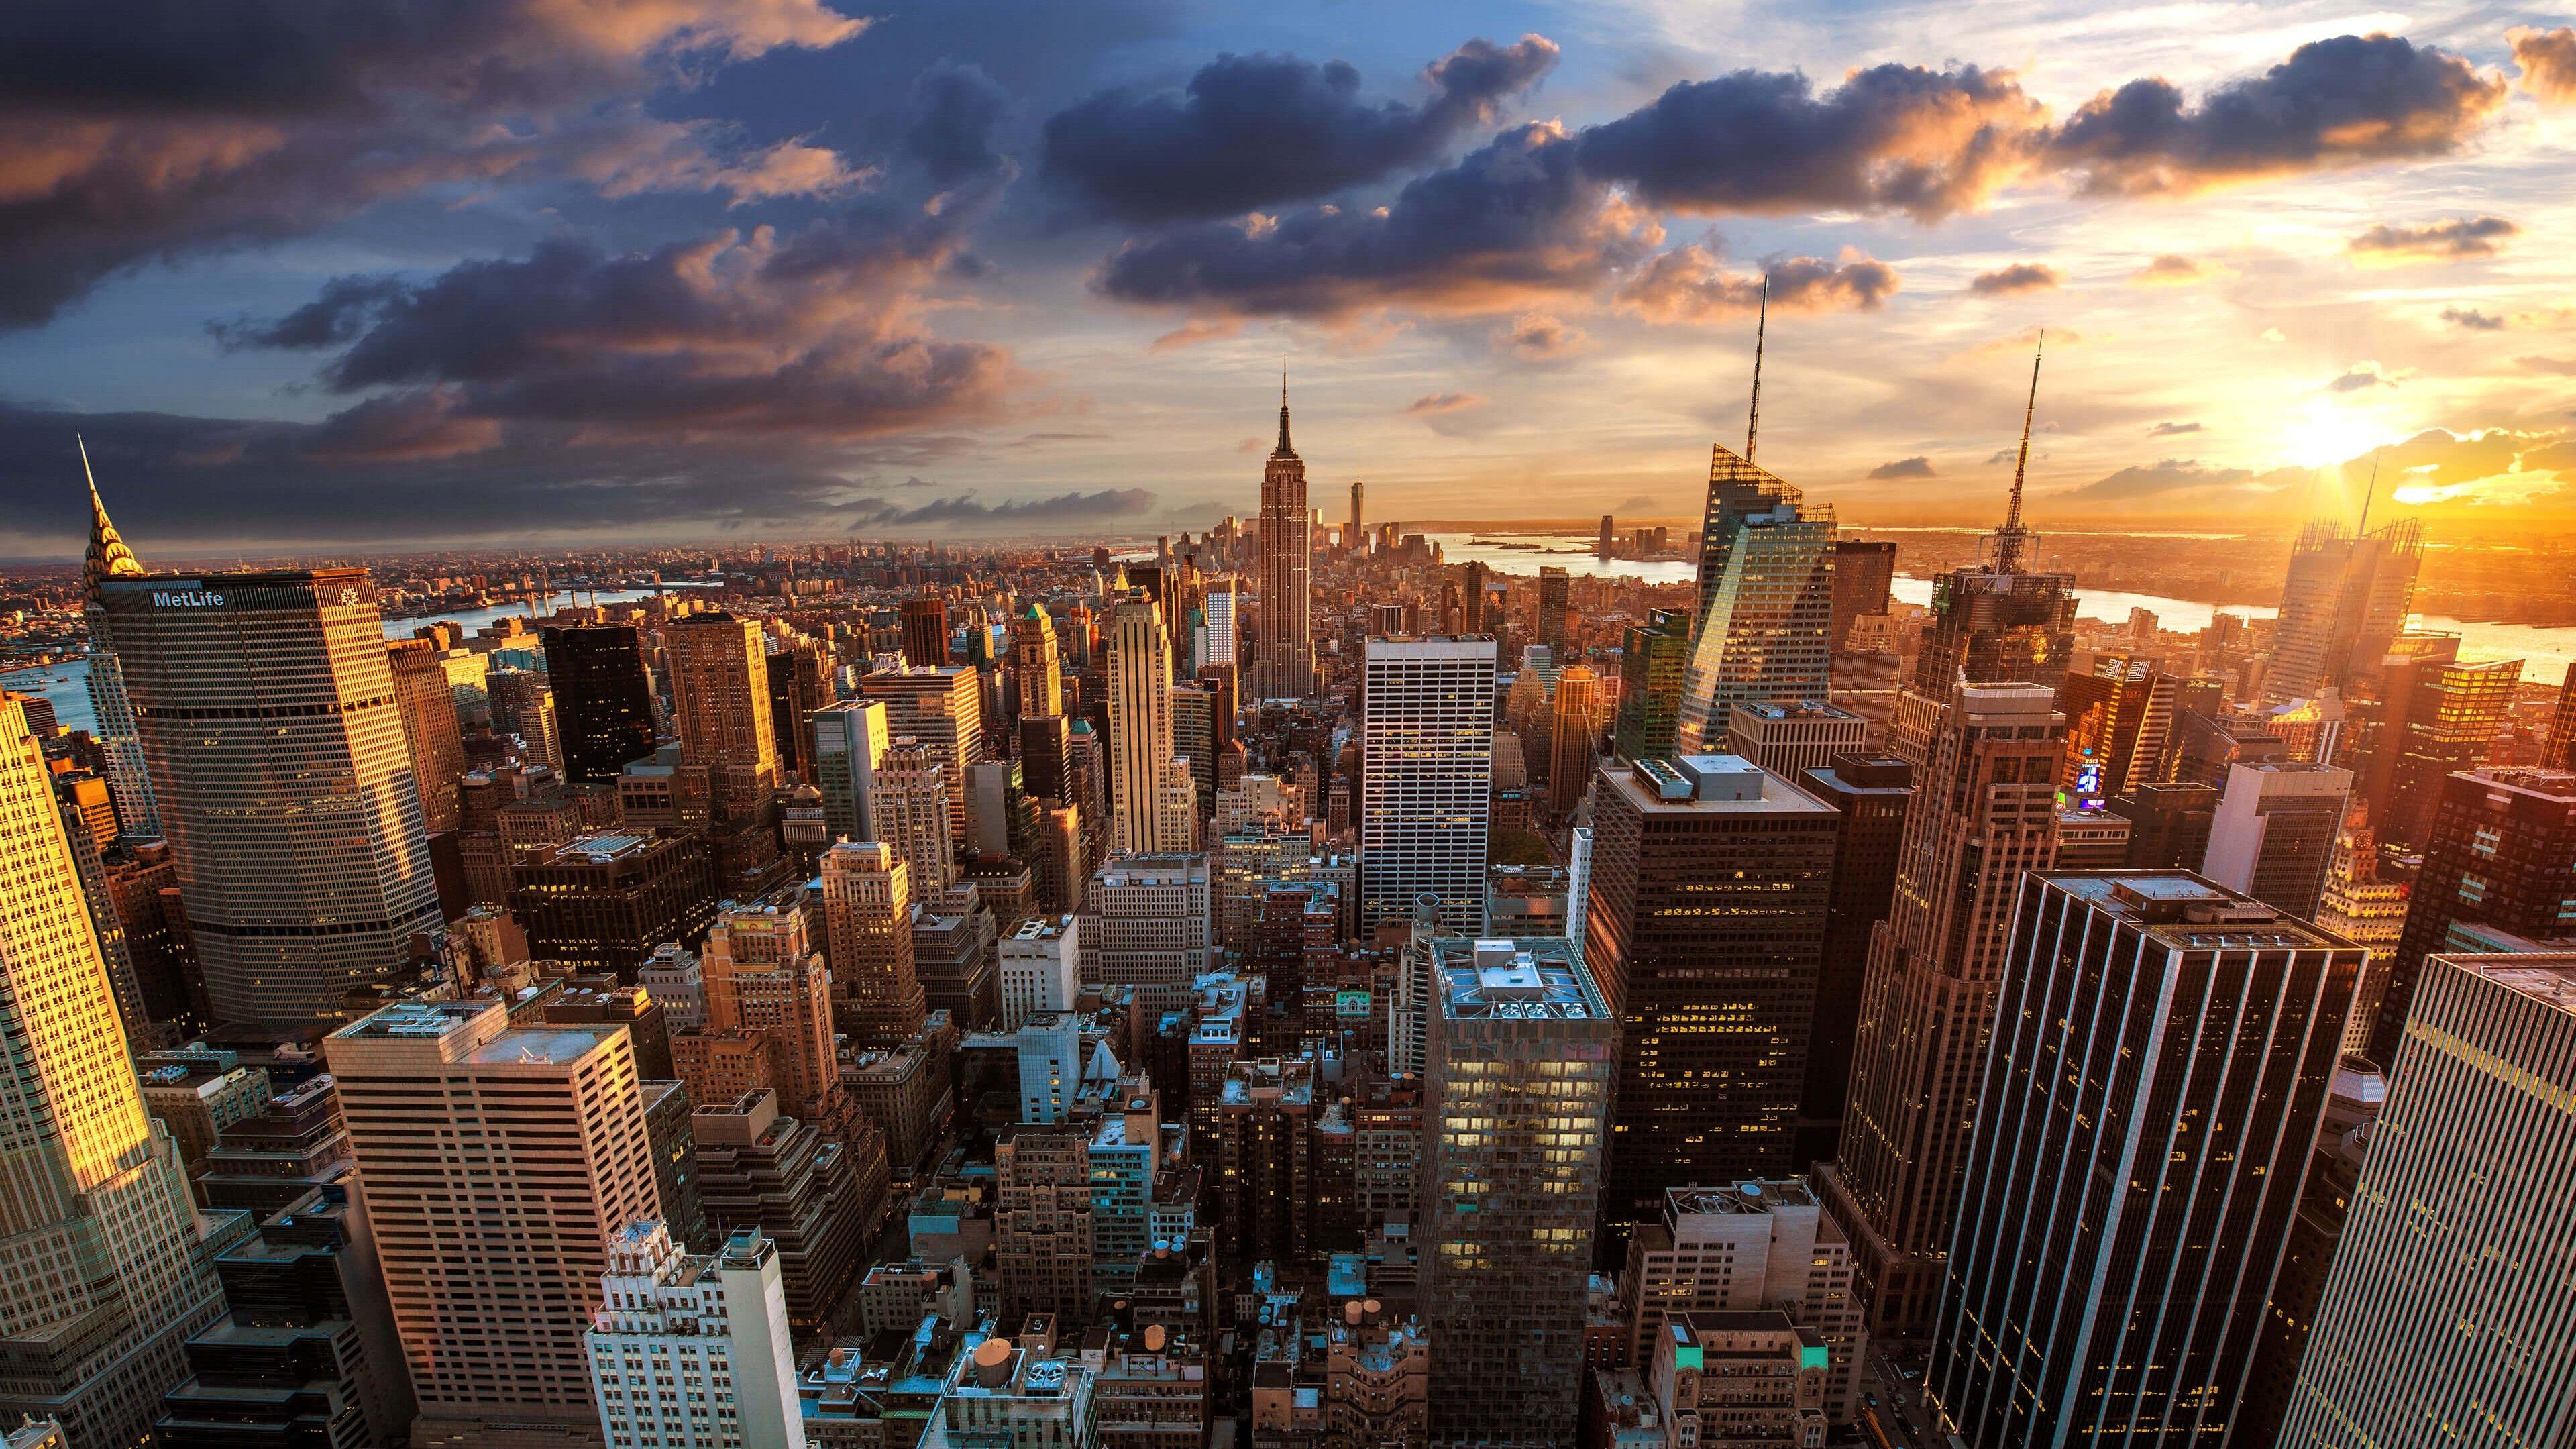 new york city at night tumblr - wallpaper. | tumblr backgrounds